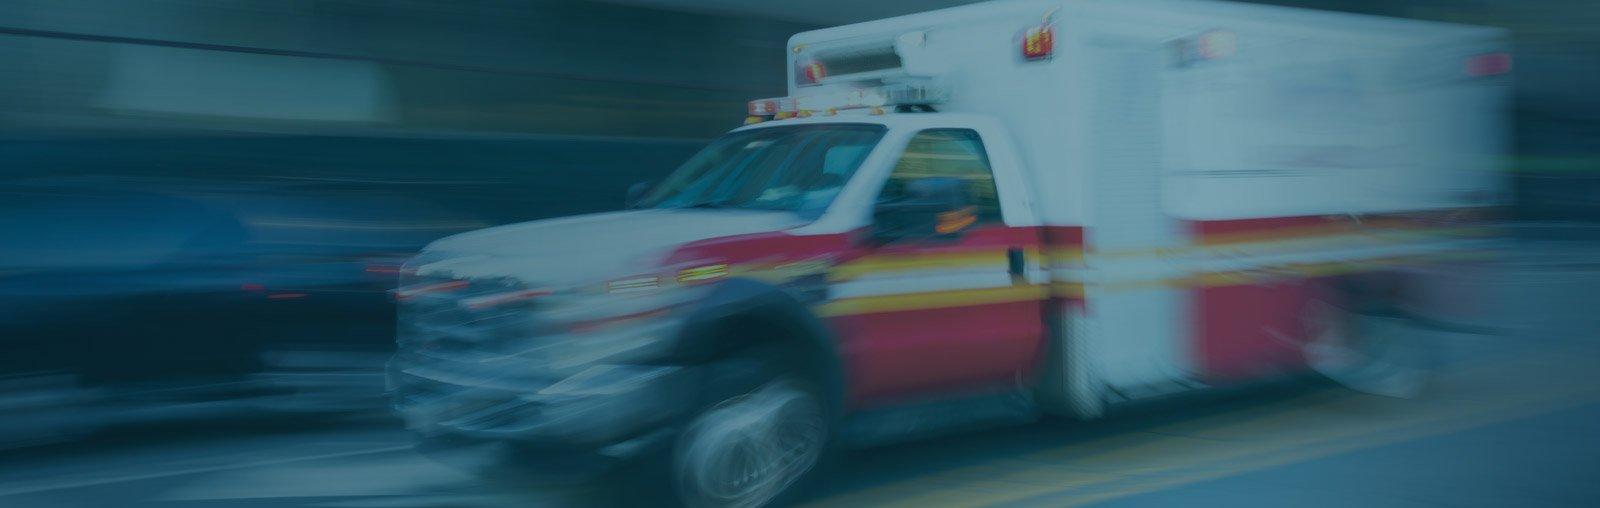 ER-Ambulance